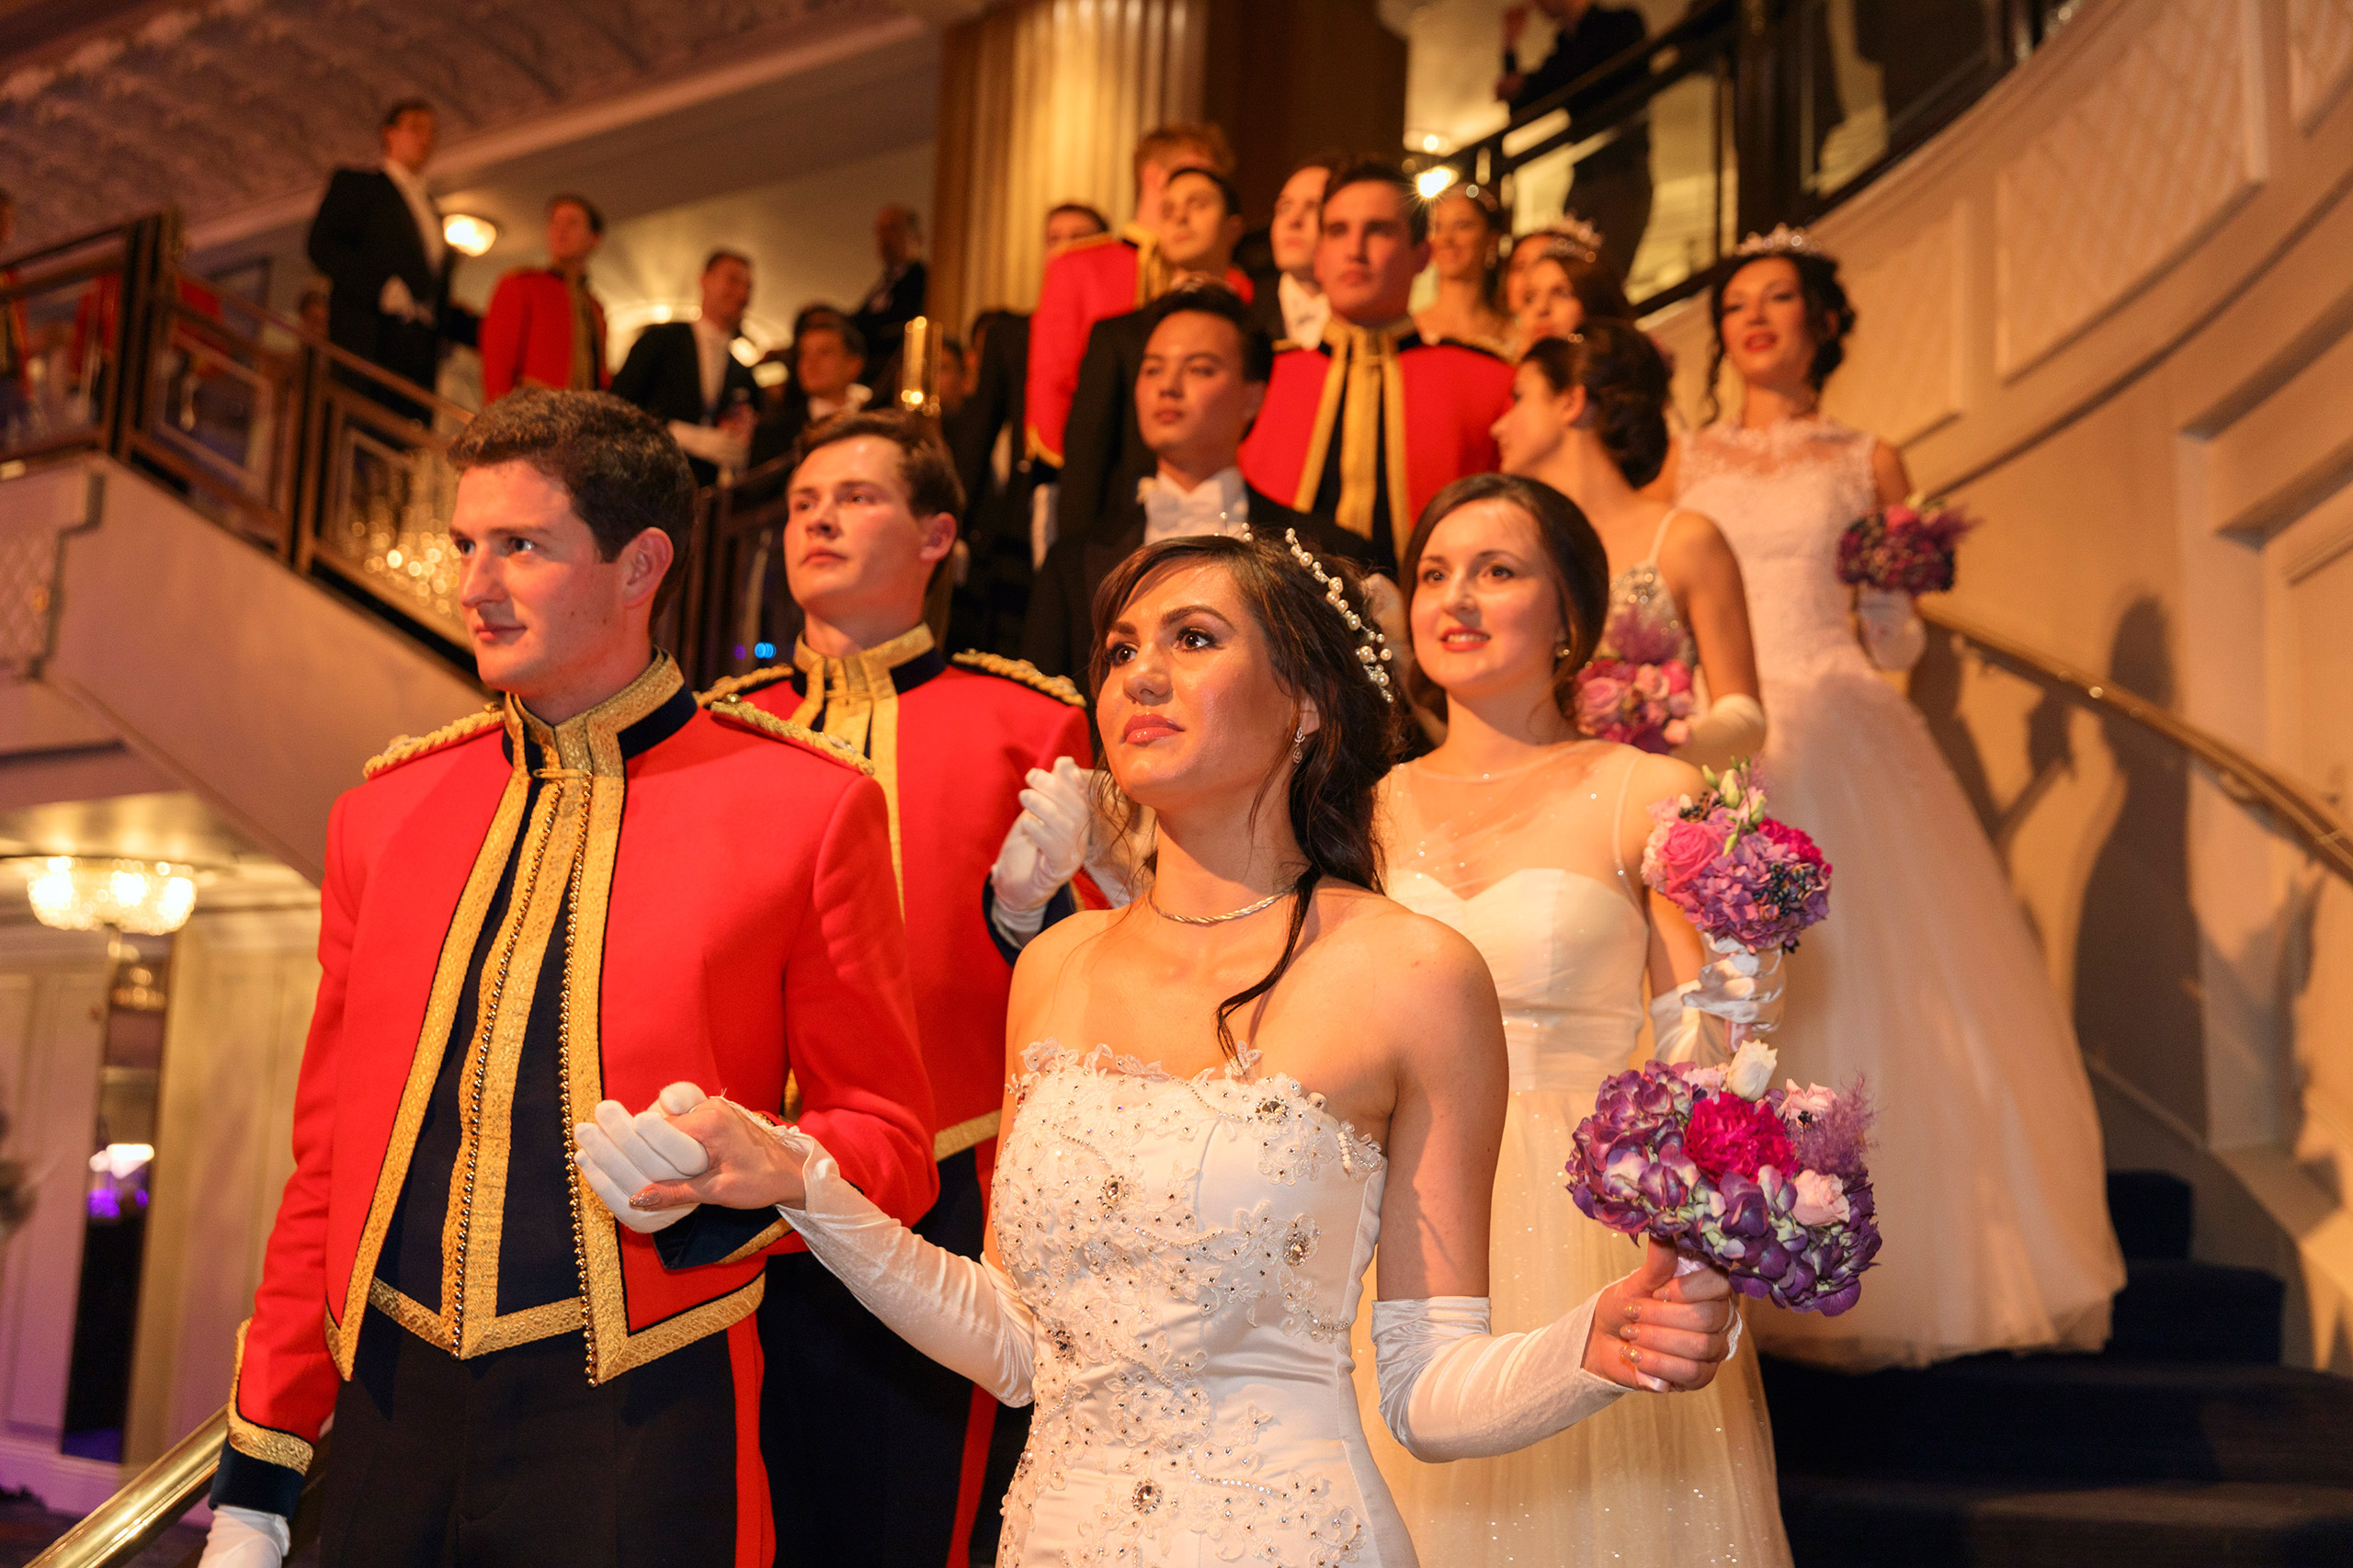 The 2016 Russian Debutante Ball at Grosvenor House Hotel, London.